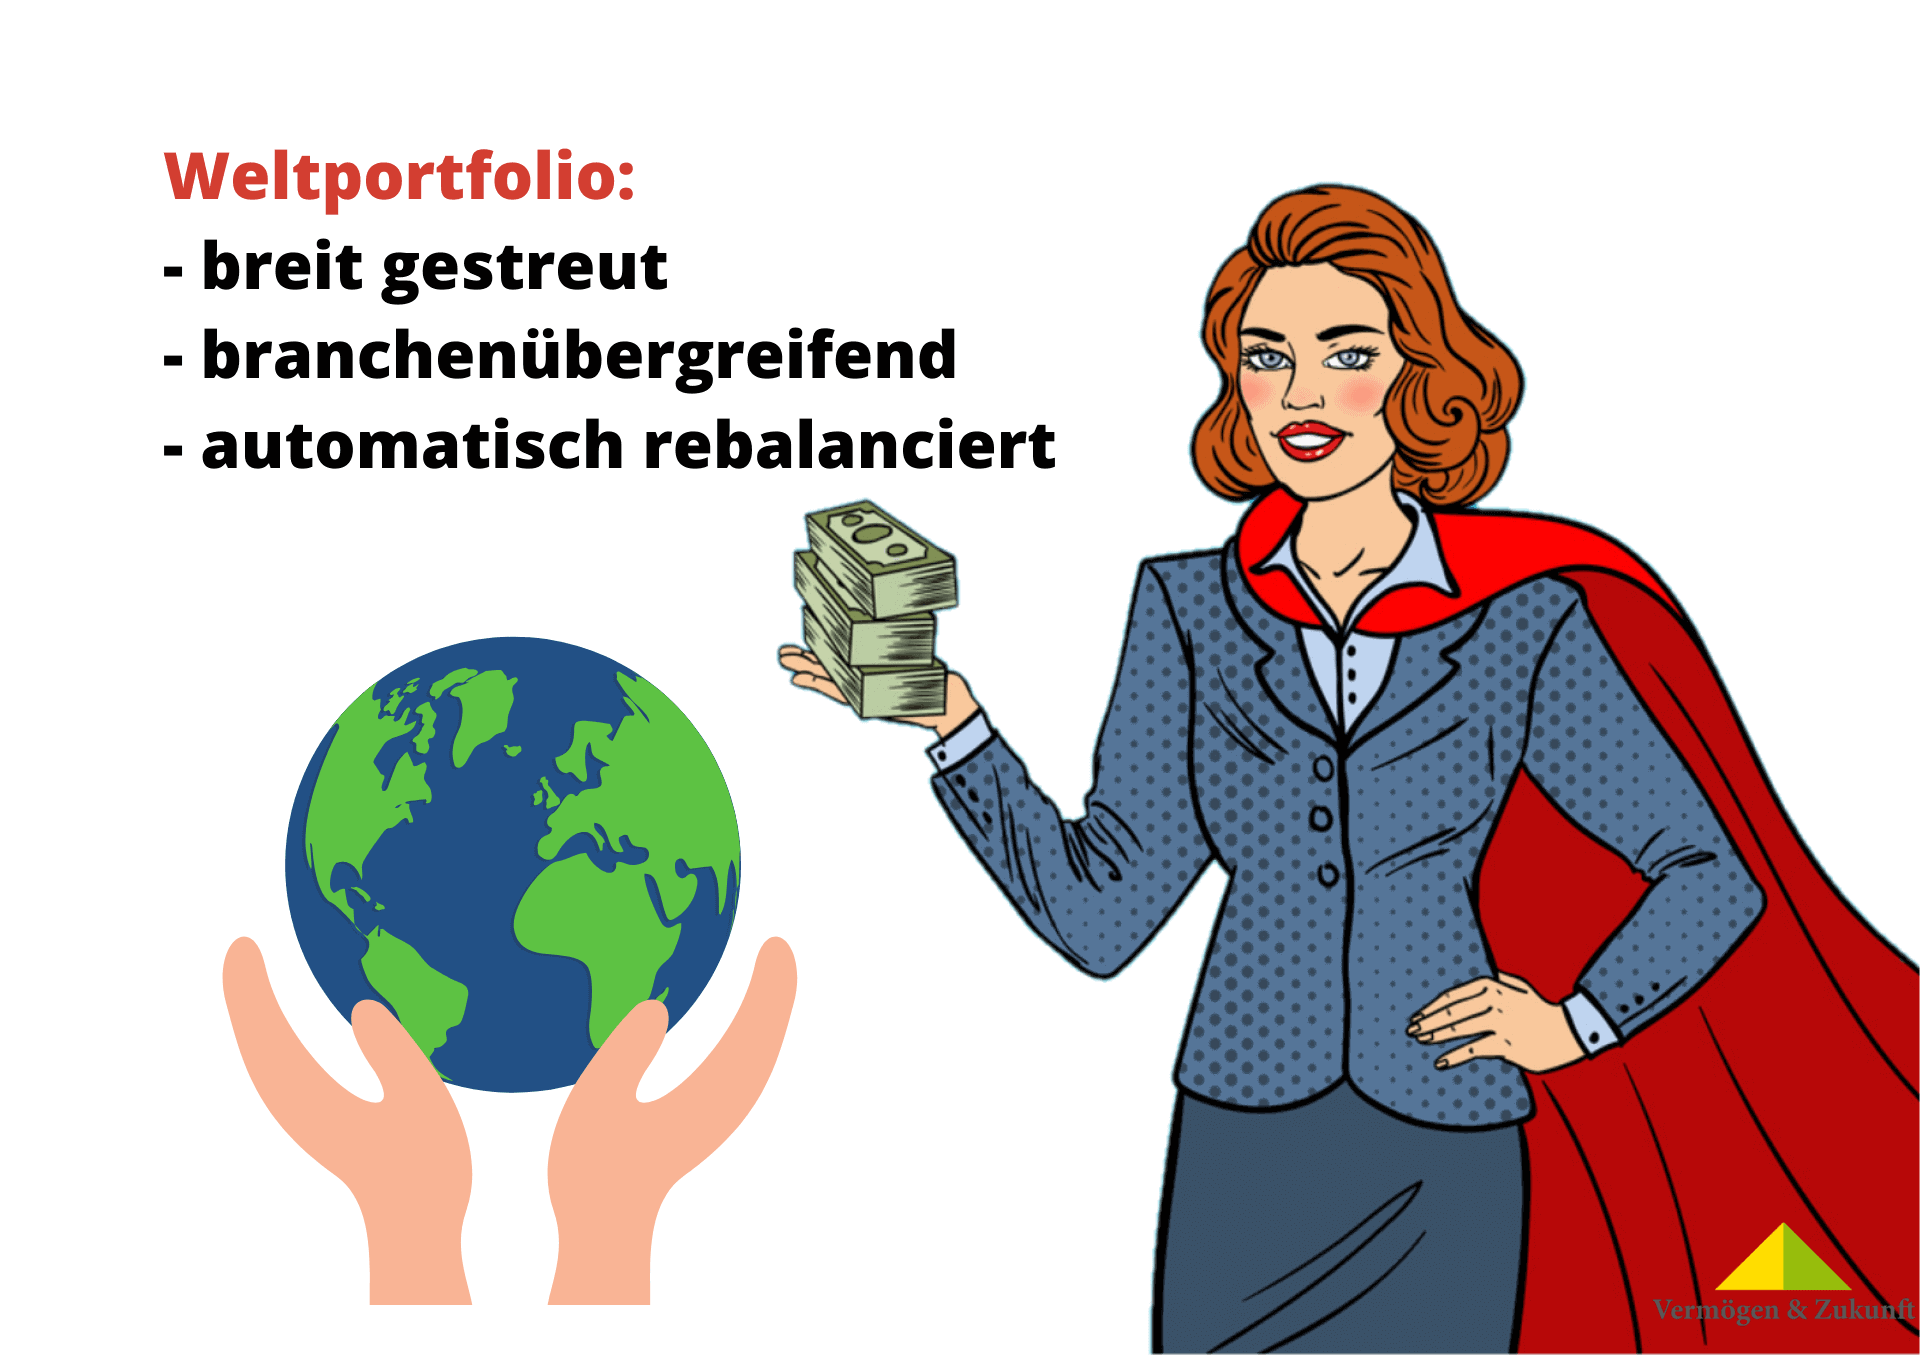 Superwoman mit Weltportfolio in Corona Börsenkrise